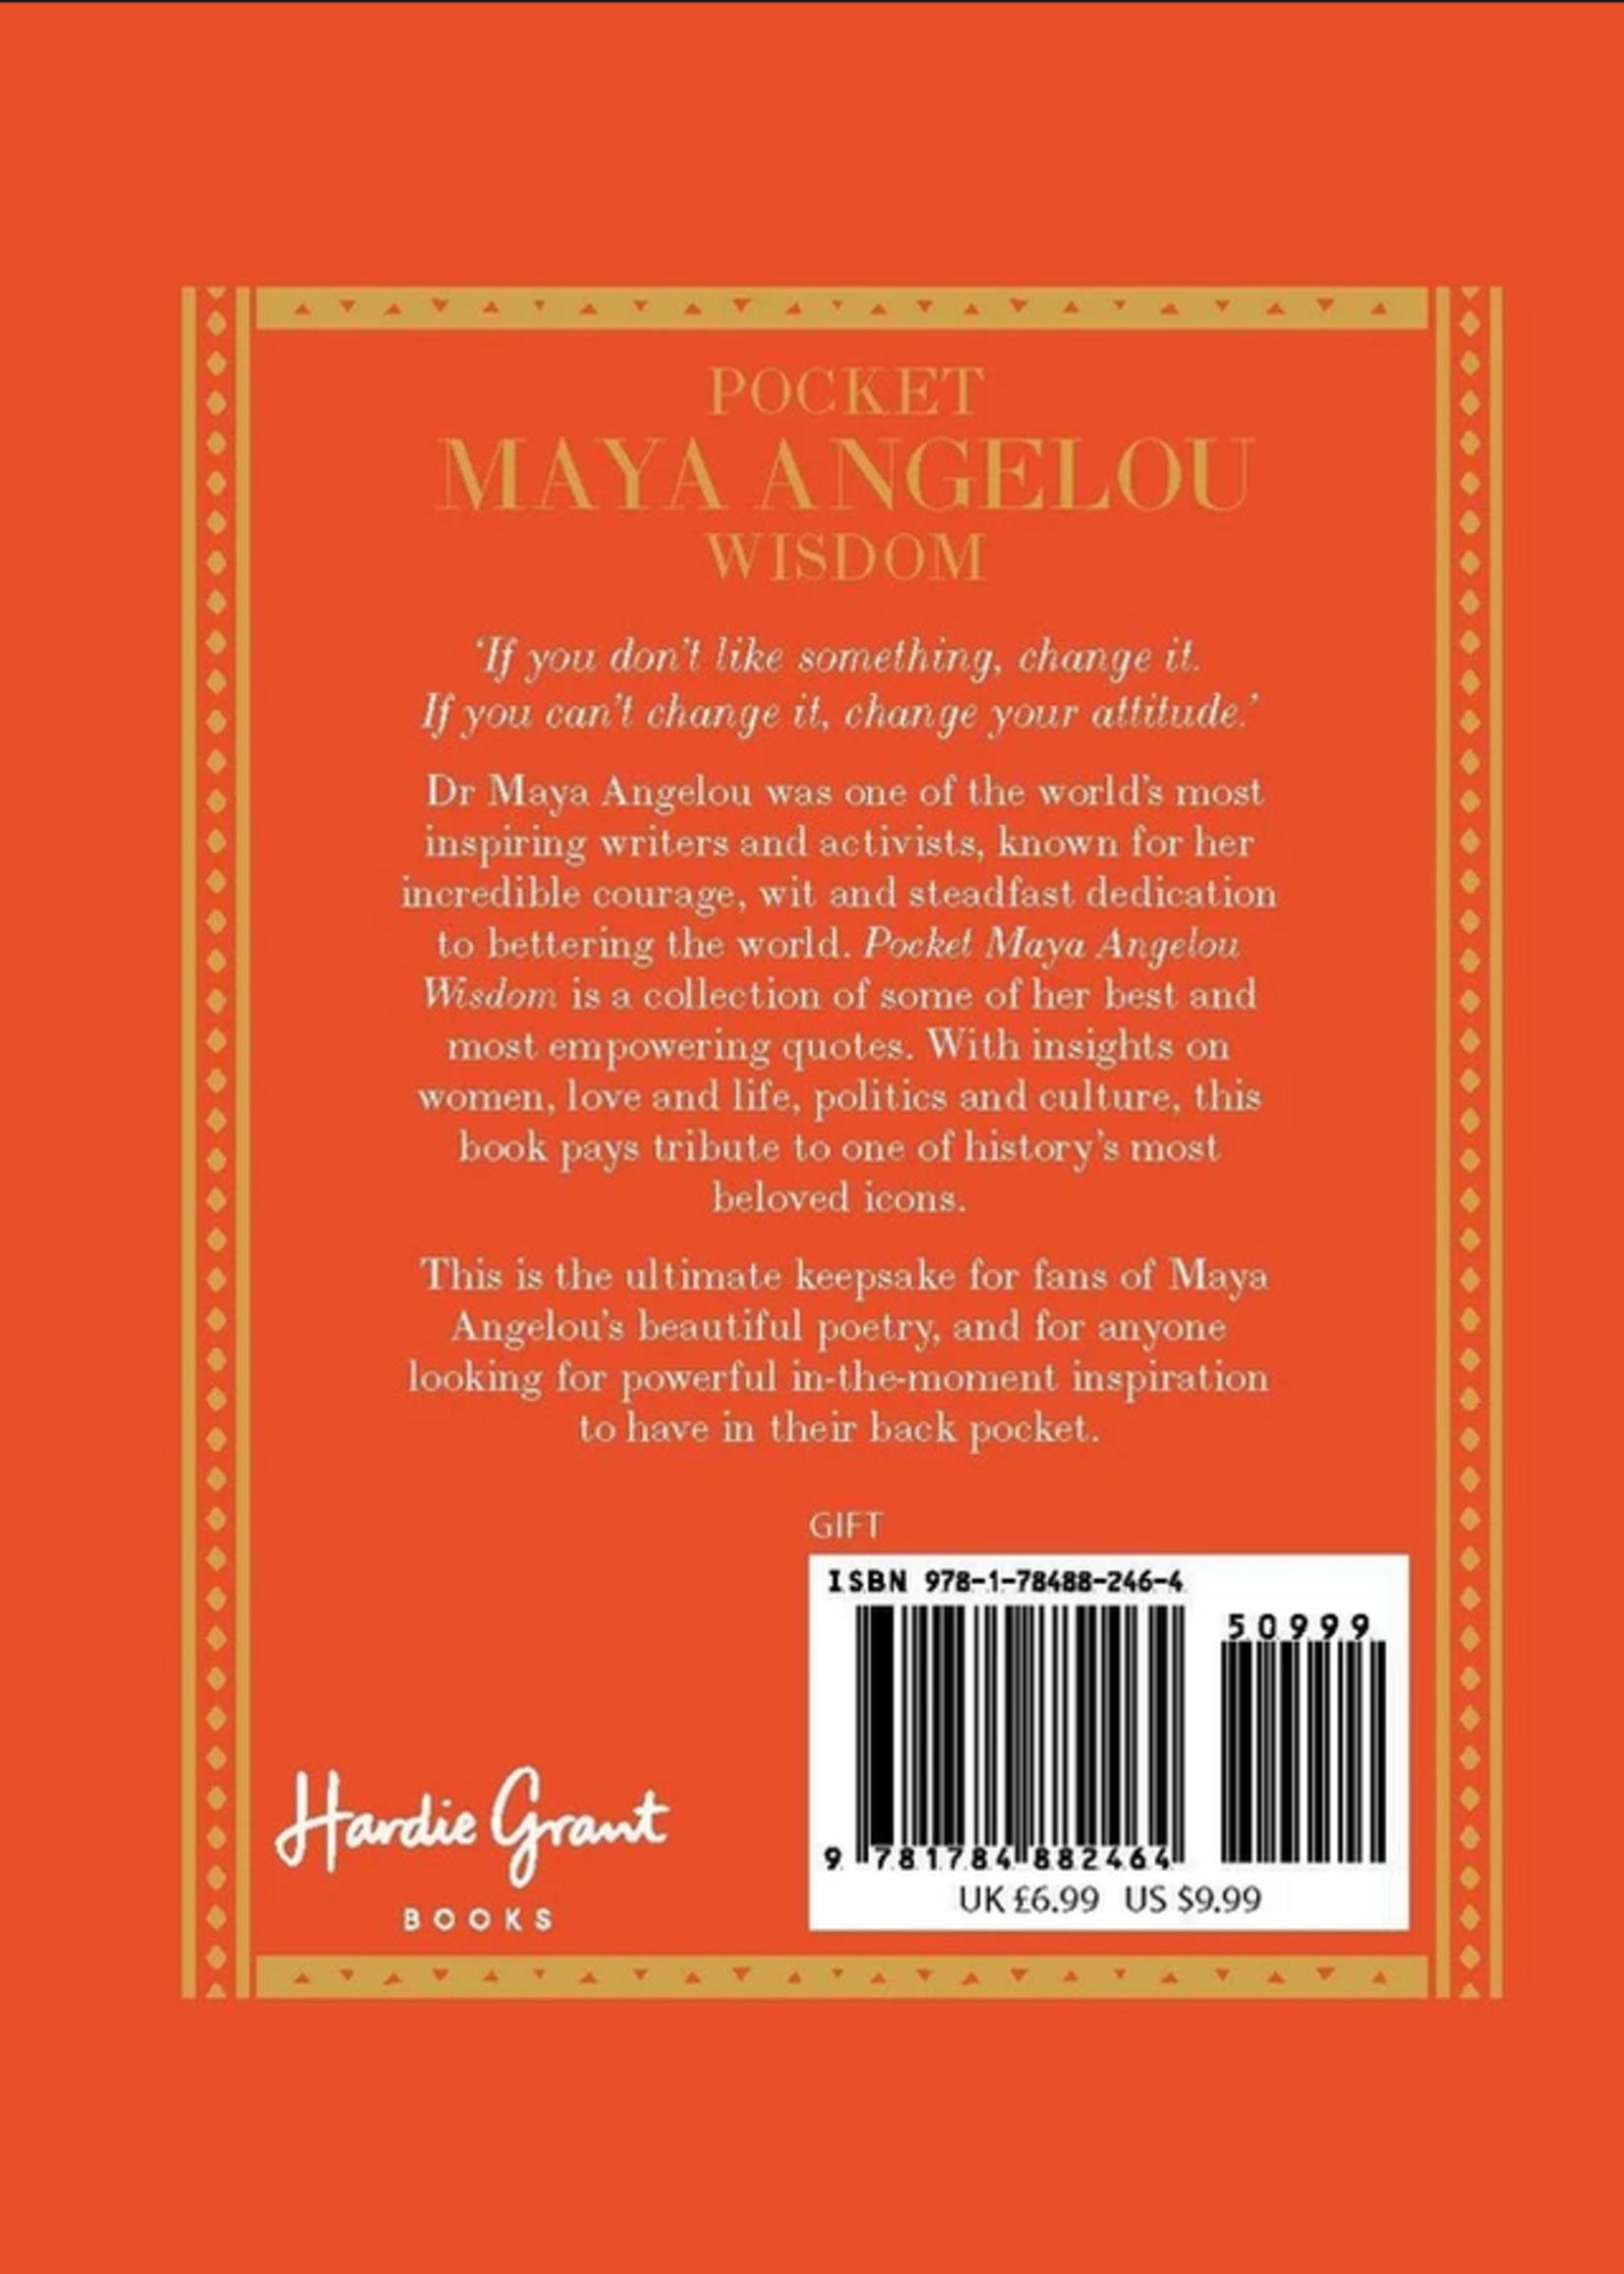 hachette book group hachette maya angelou pocket book